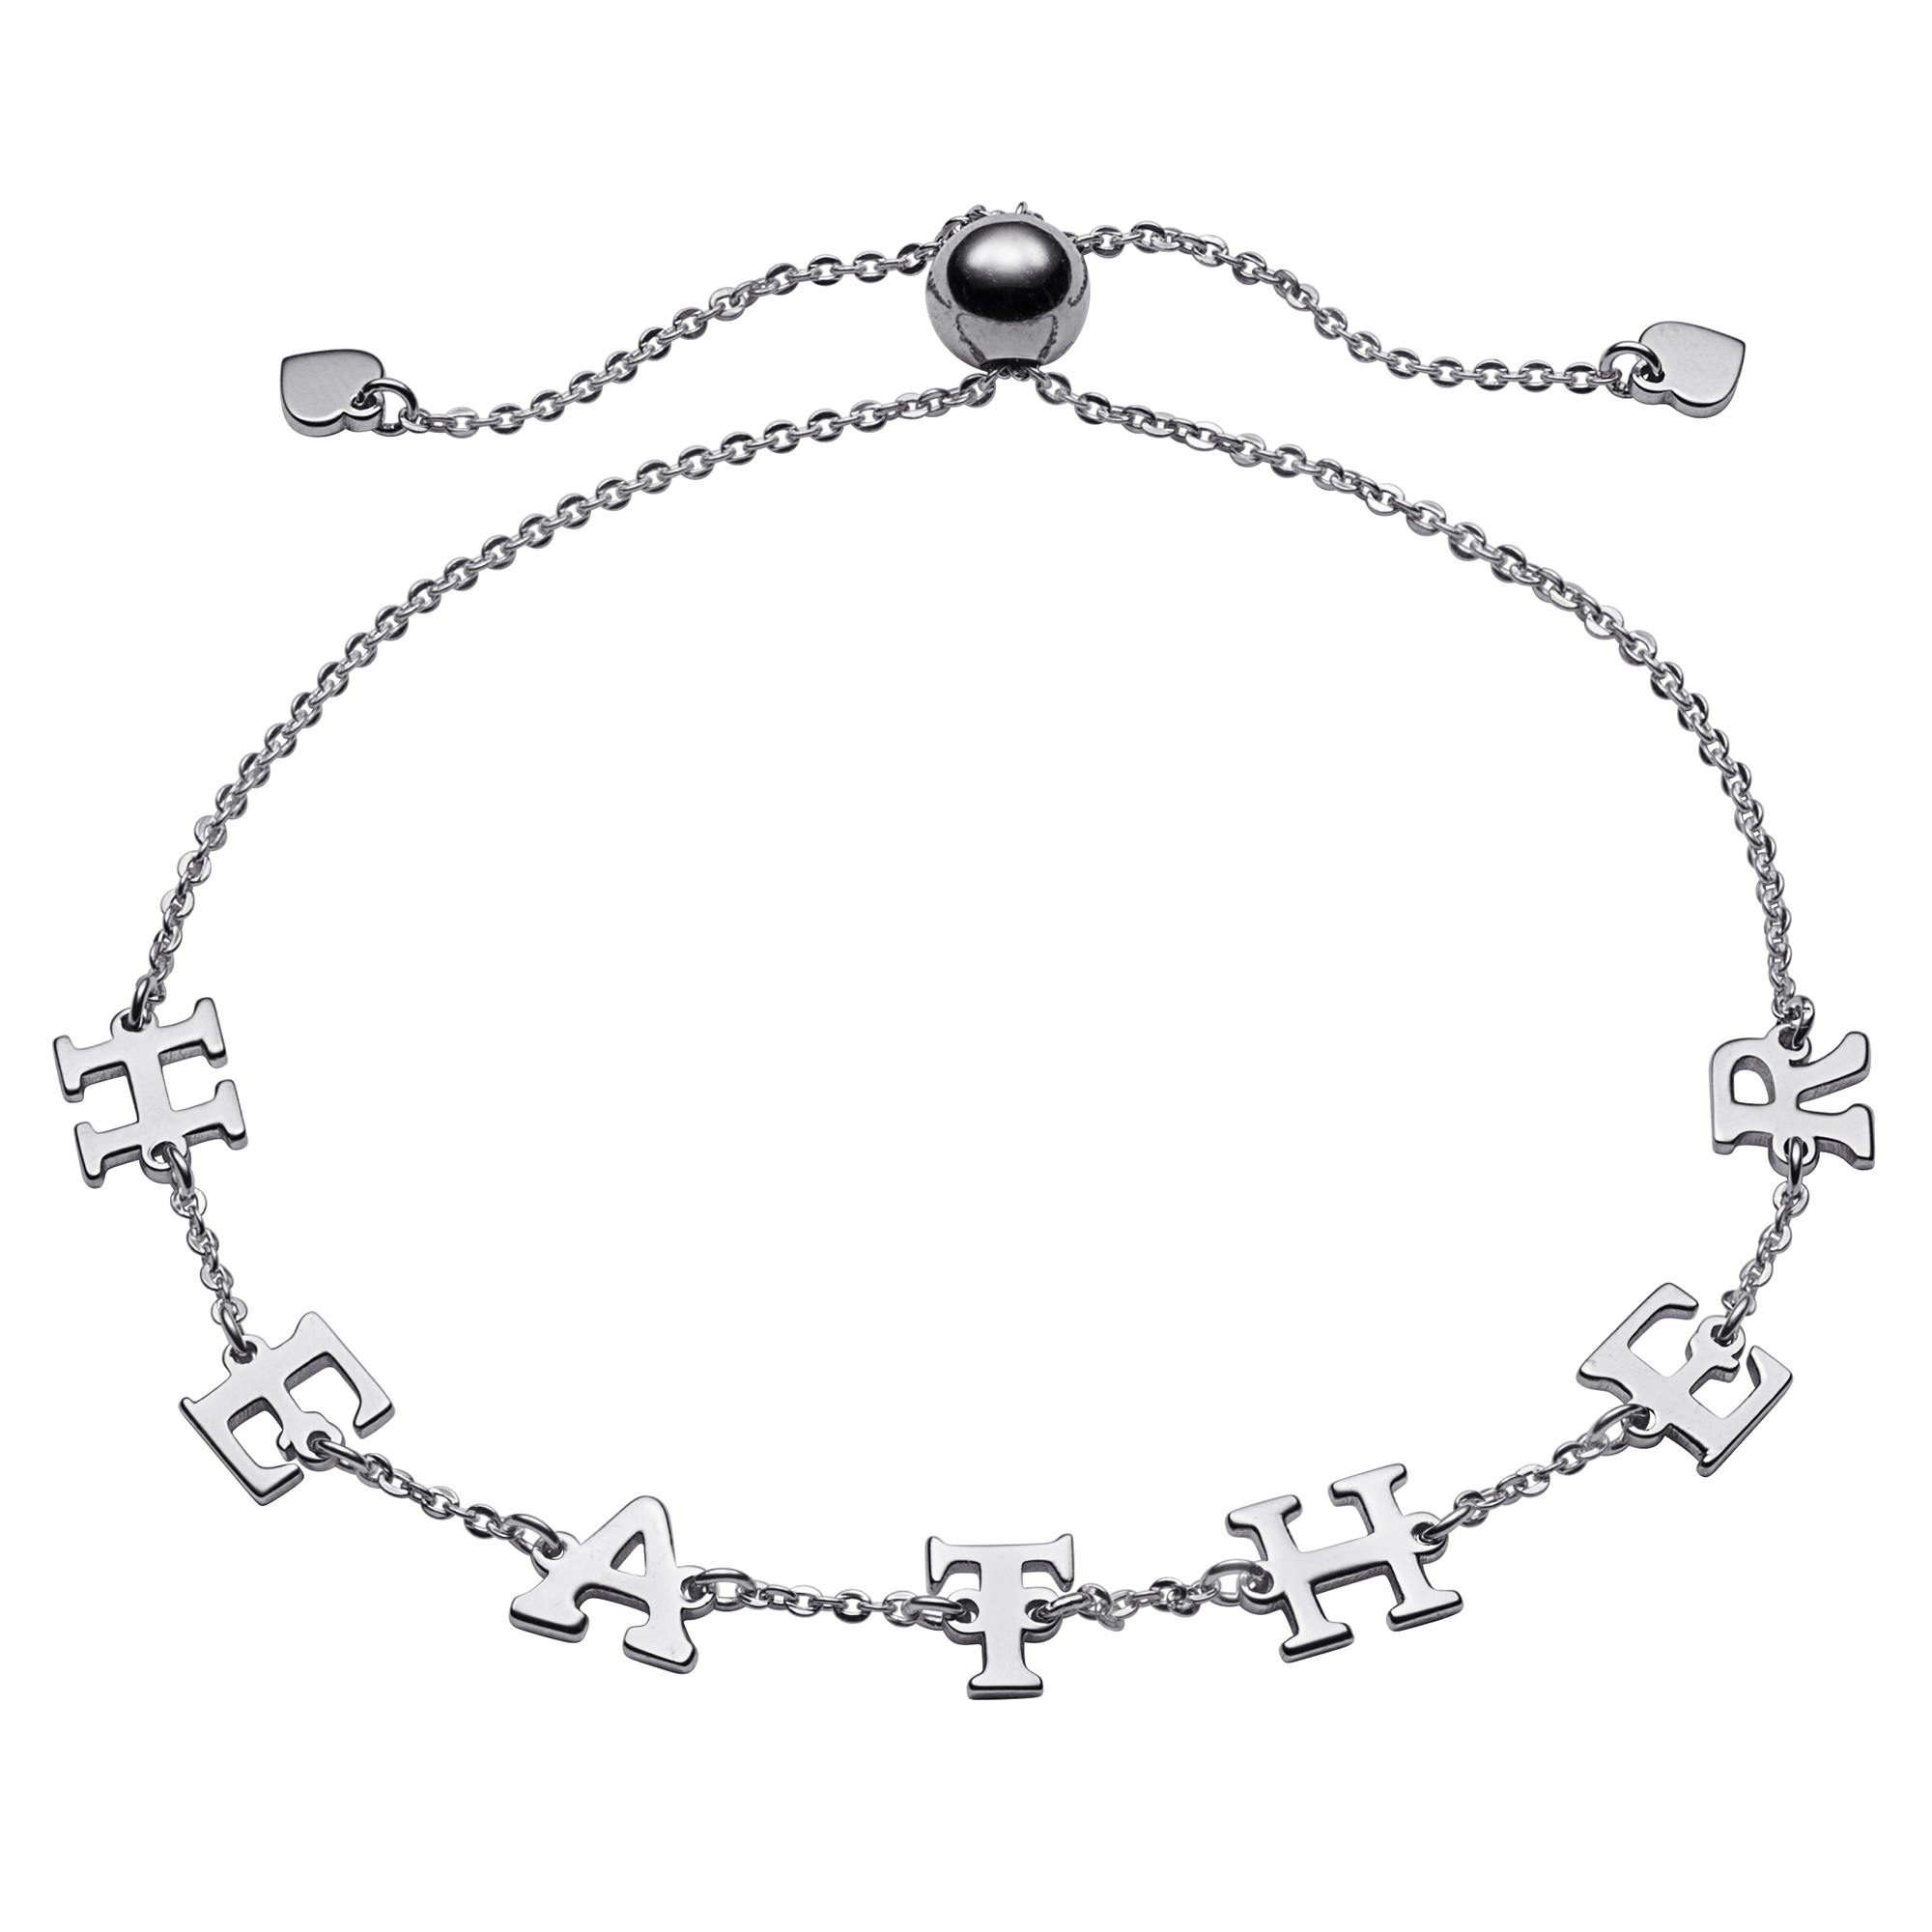 Personalized Women's Sterling Silver or 14kt Gold over Silver Adjustable Name Bracelet